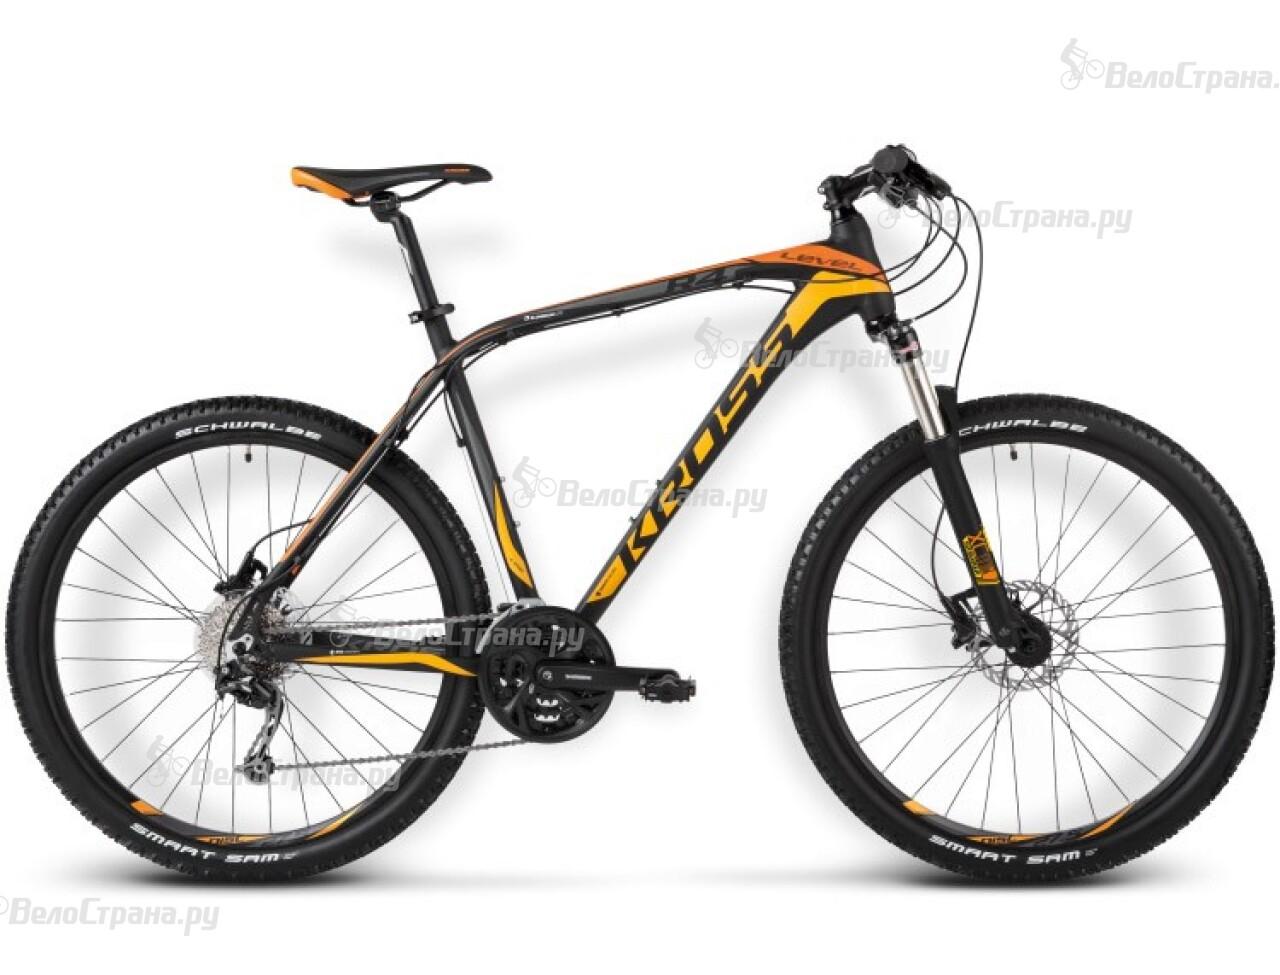 Велосипед Kross Level R4 (2015)  r4 5a